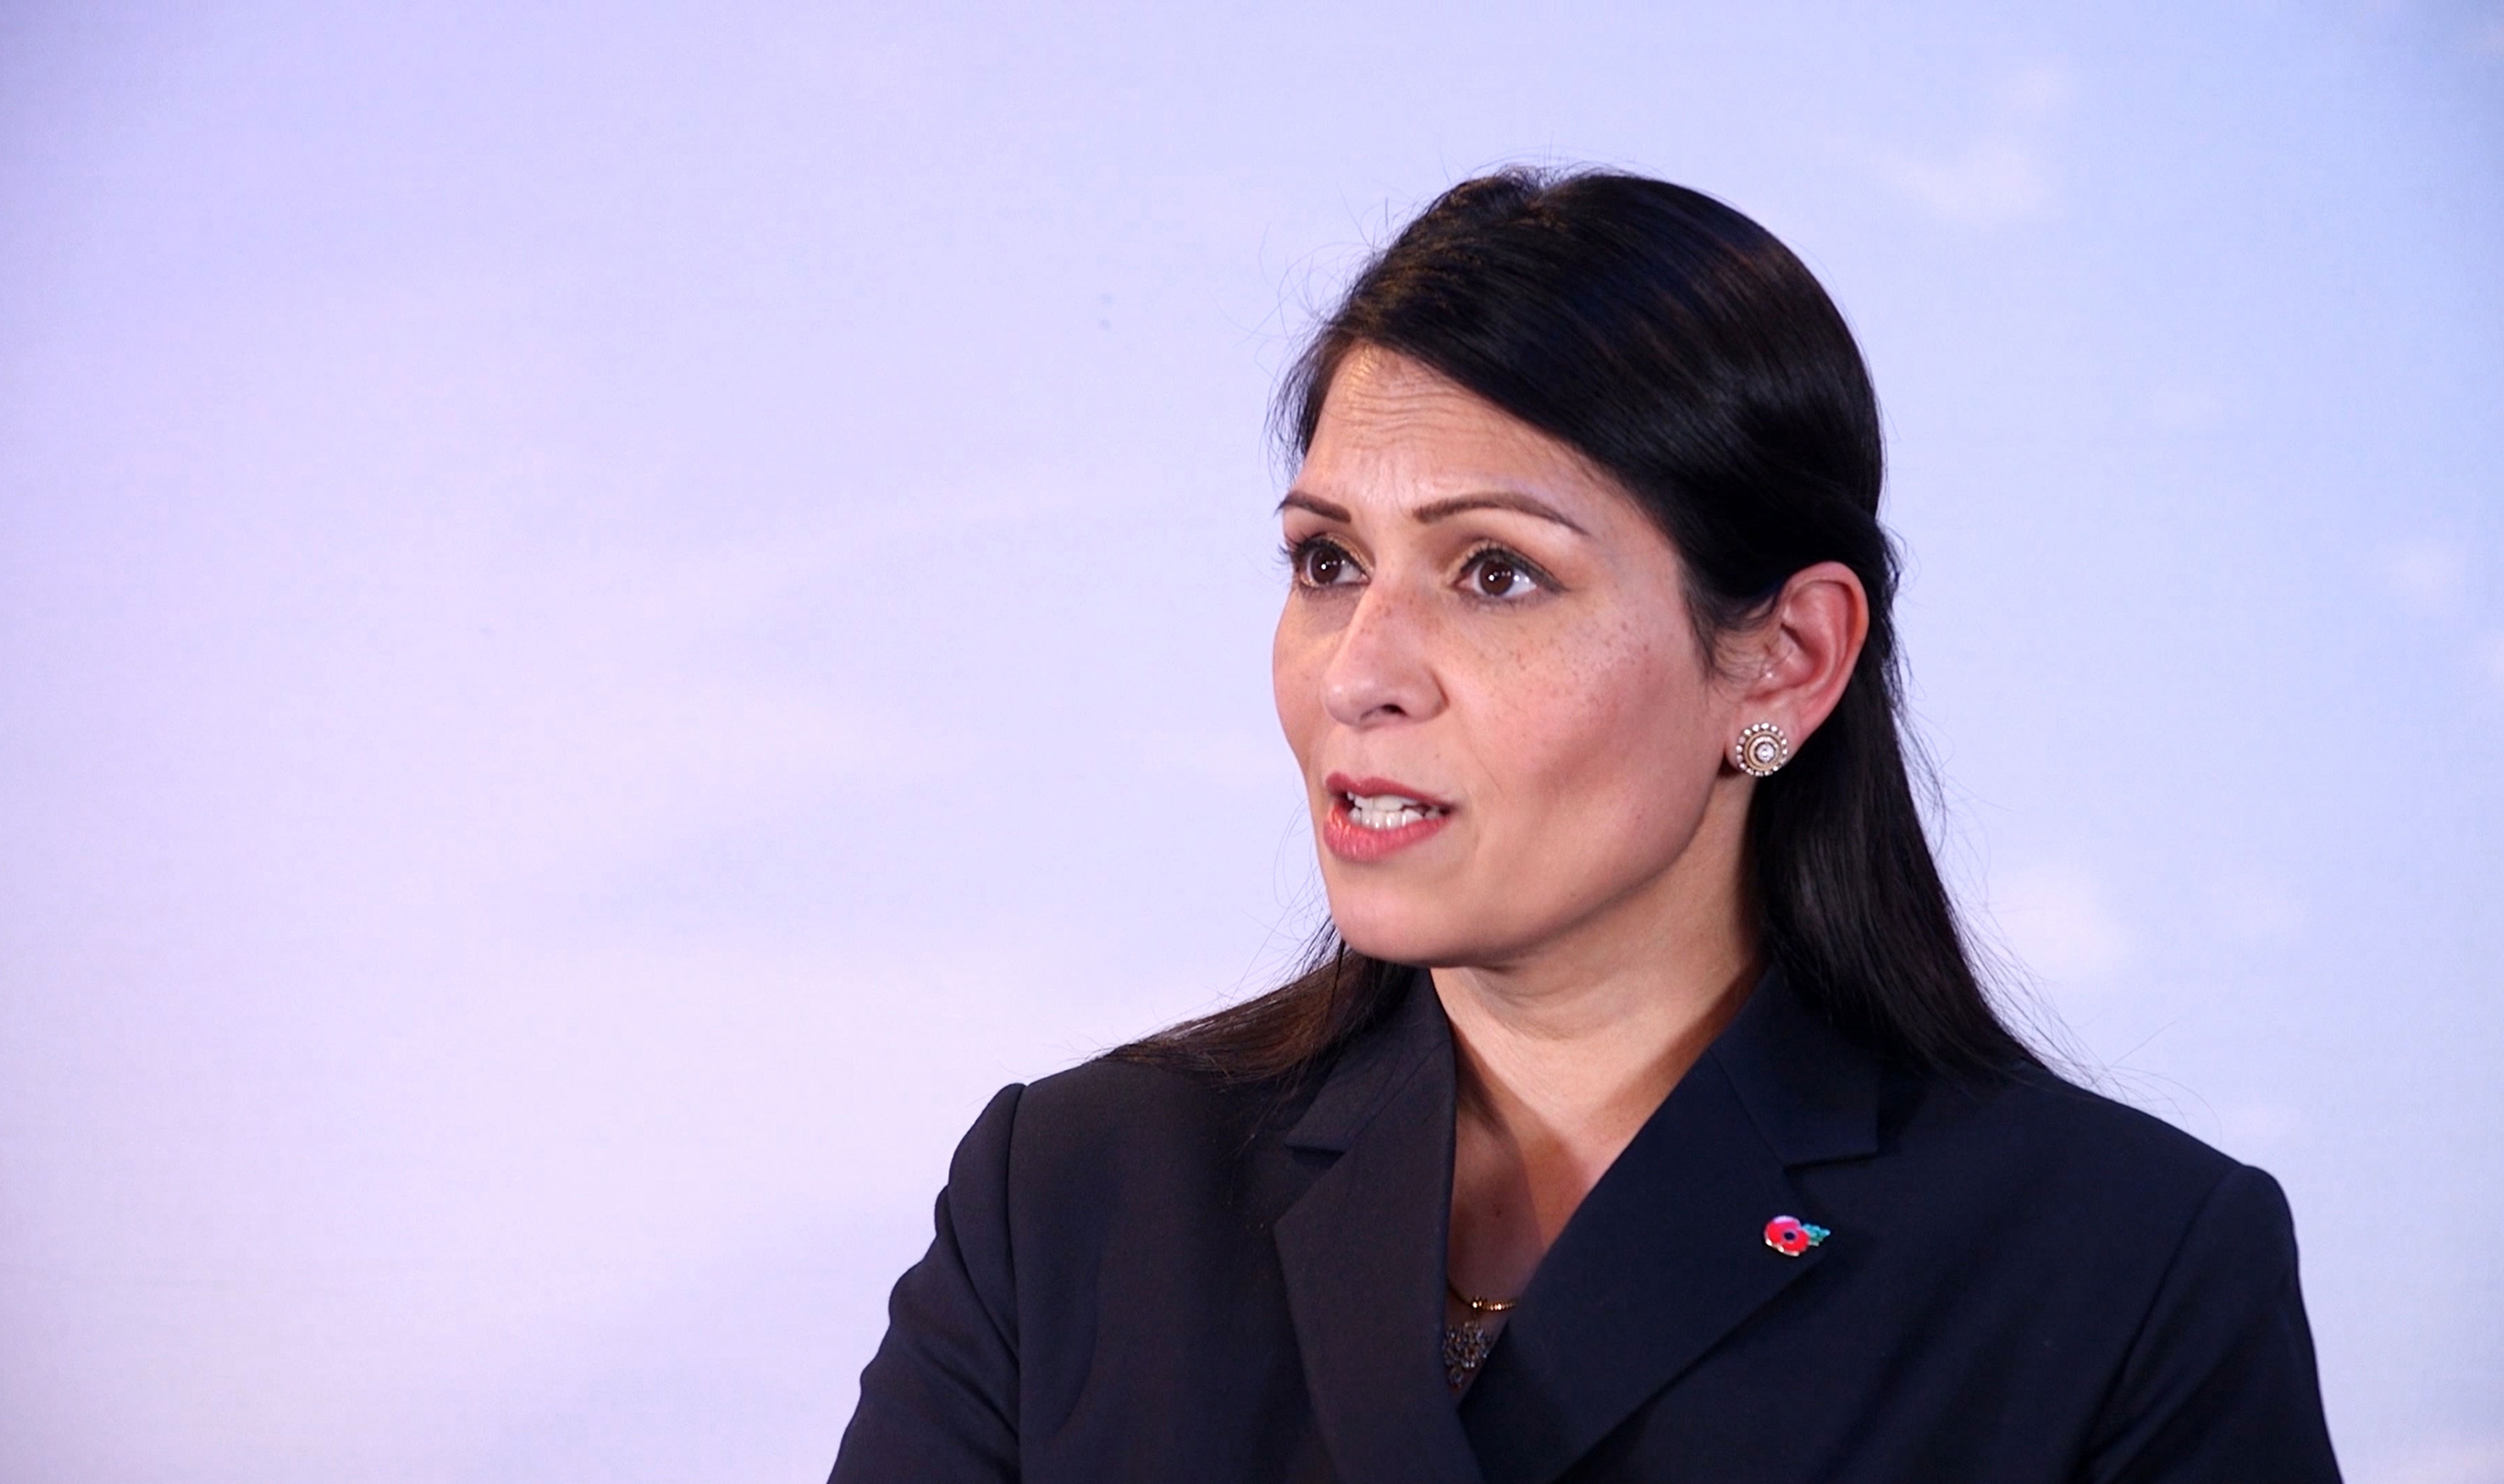 Priti Patel, British home secretary, speaks on November 3.